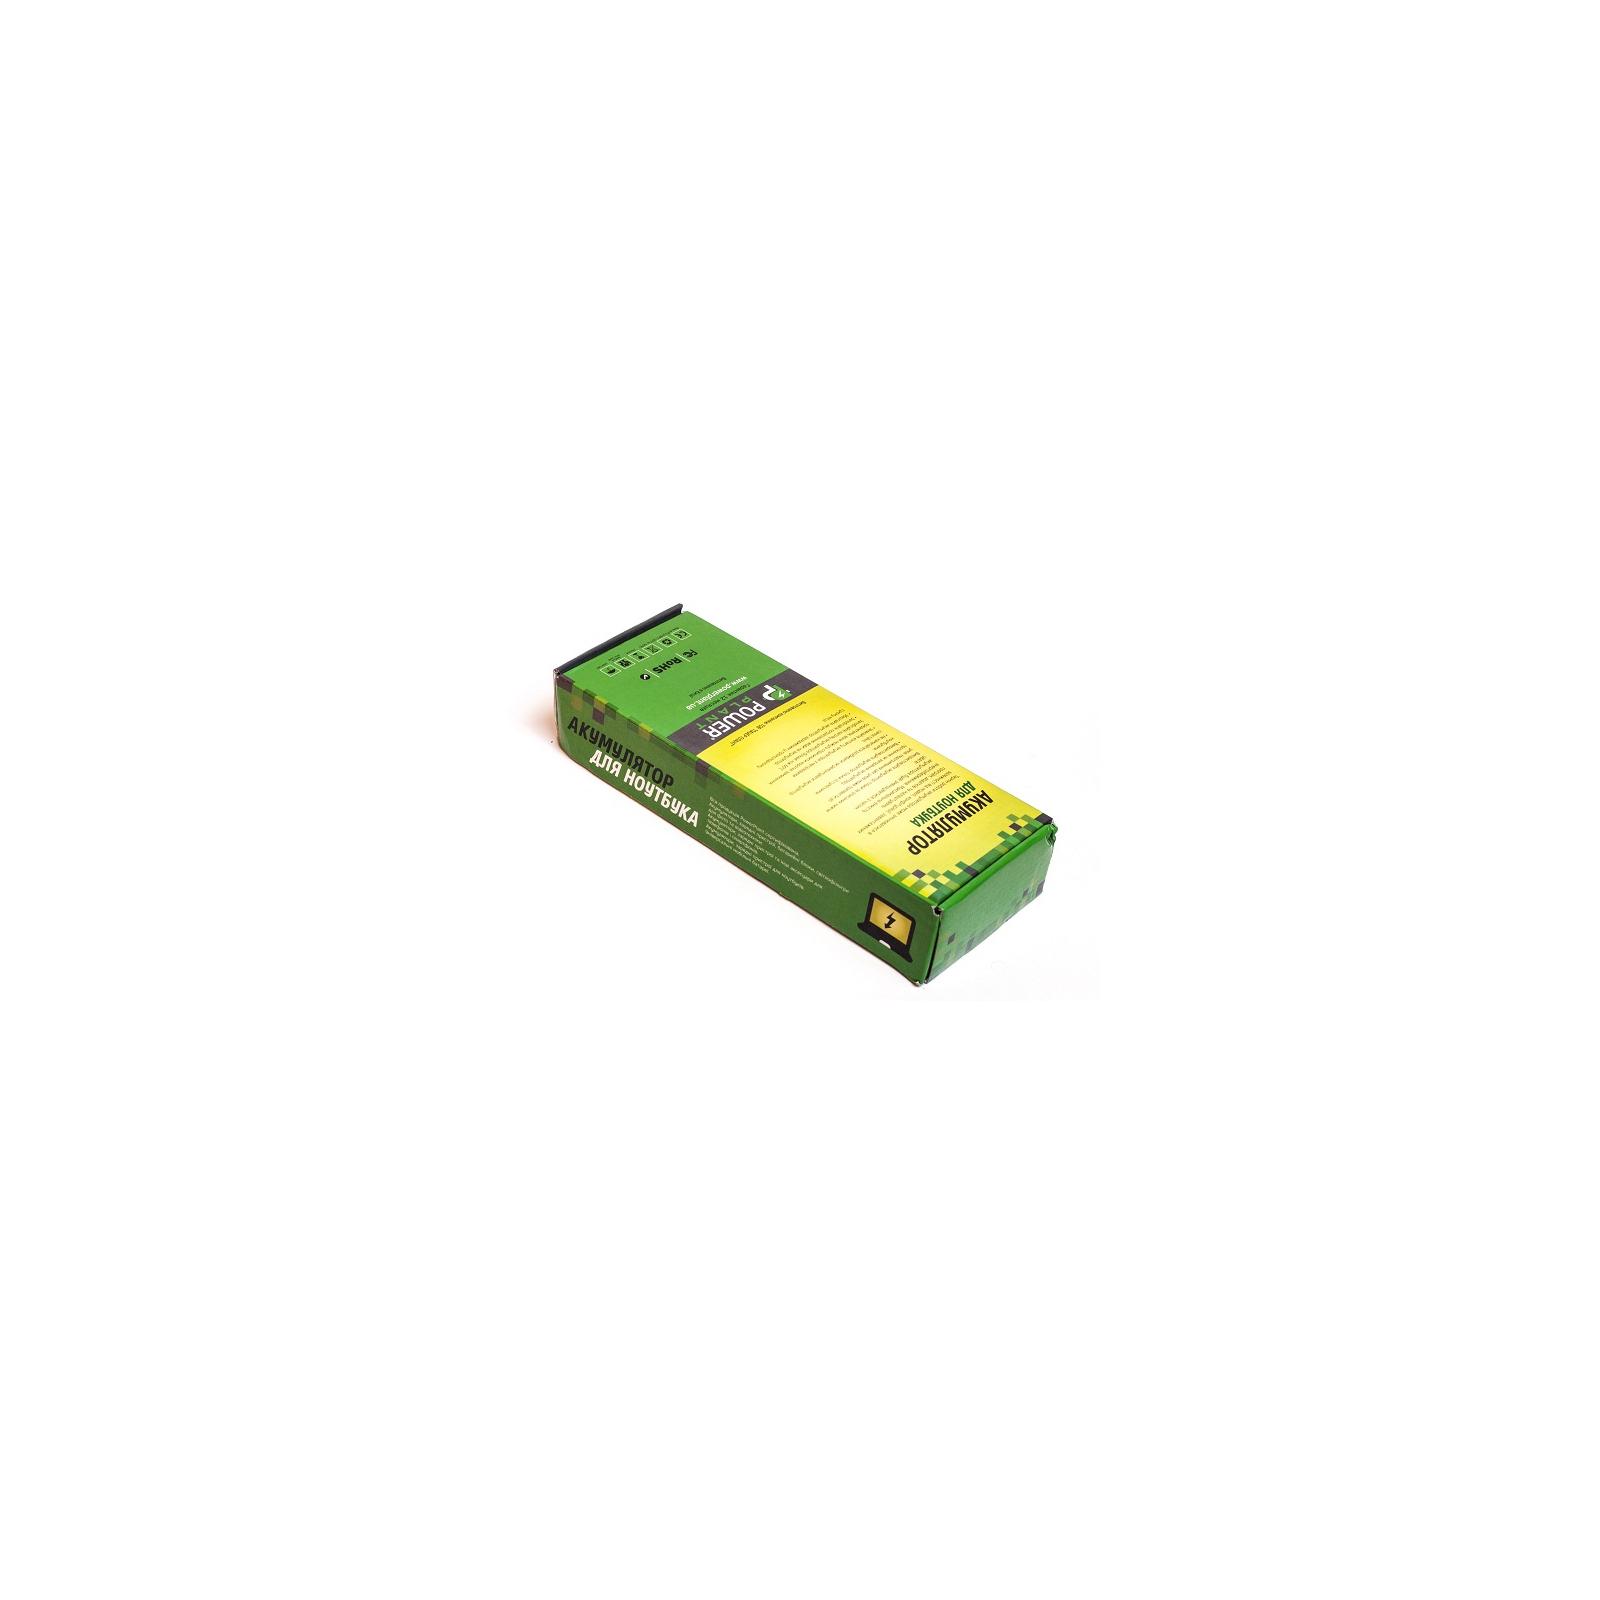 Аккумулятор для ноутбука SONY VAIO PCG-6C1N (VGP-BPS2, SY5651LH) 11.1V 5200mAh PowerPlant (NB00000138) изображение 2